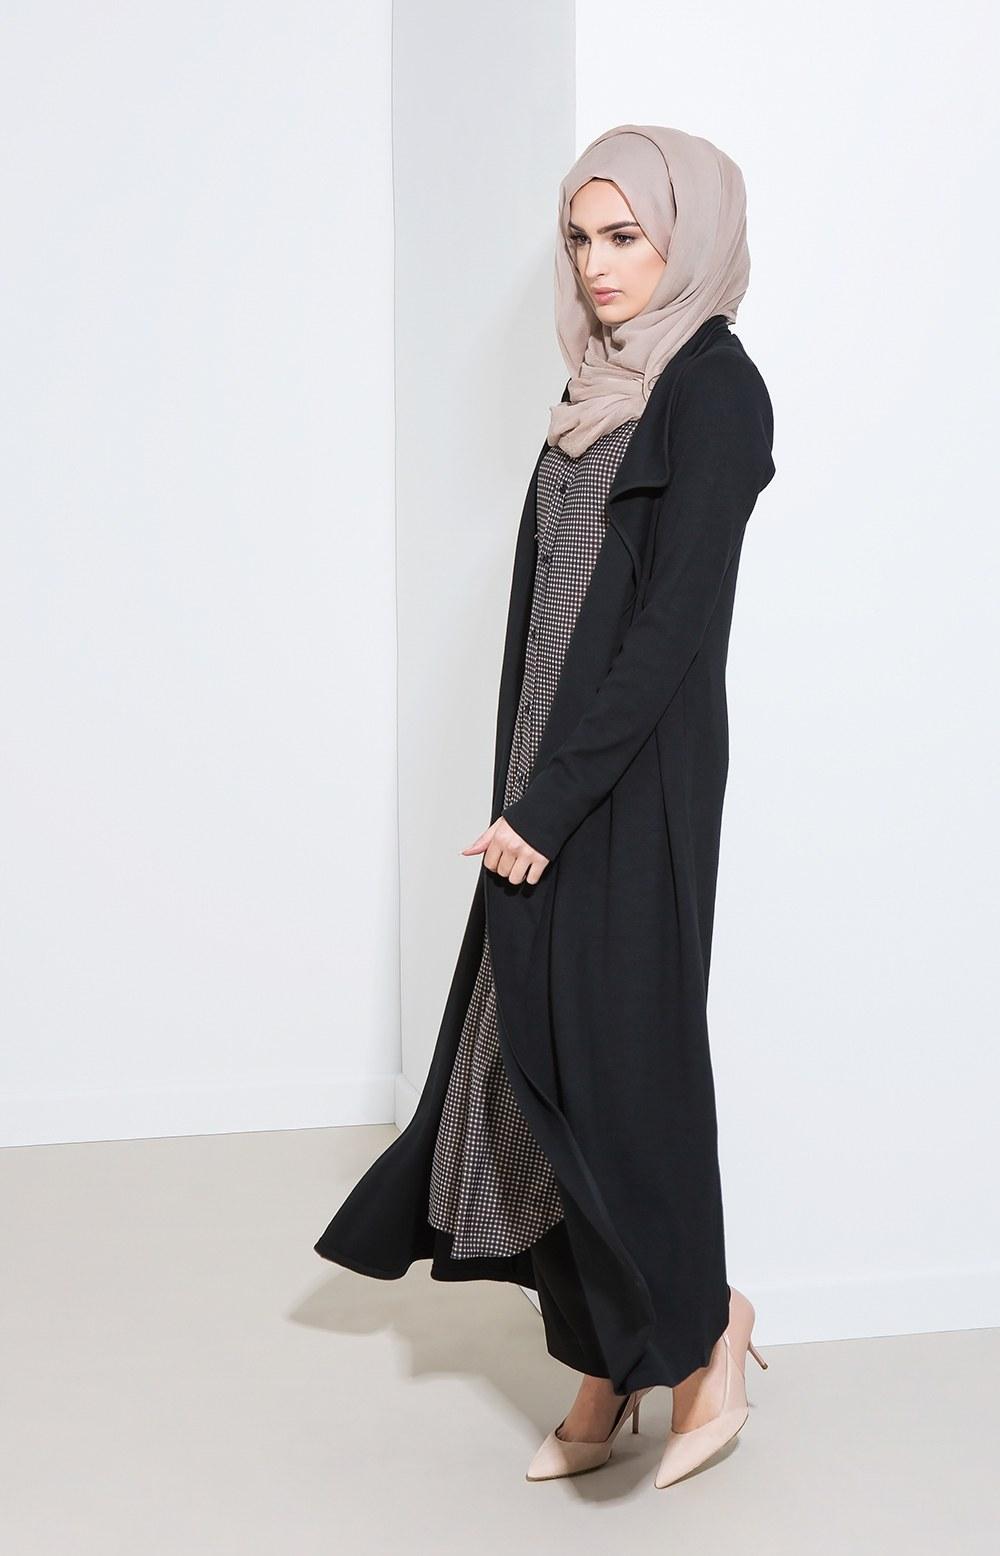 Ide Trend Baju Lebaran 2017 Rldj 25 Trend Model Baju Muslim Lebaran 2018 Simple & Modis